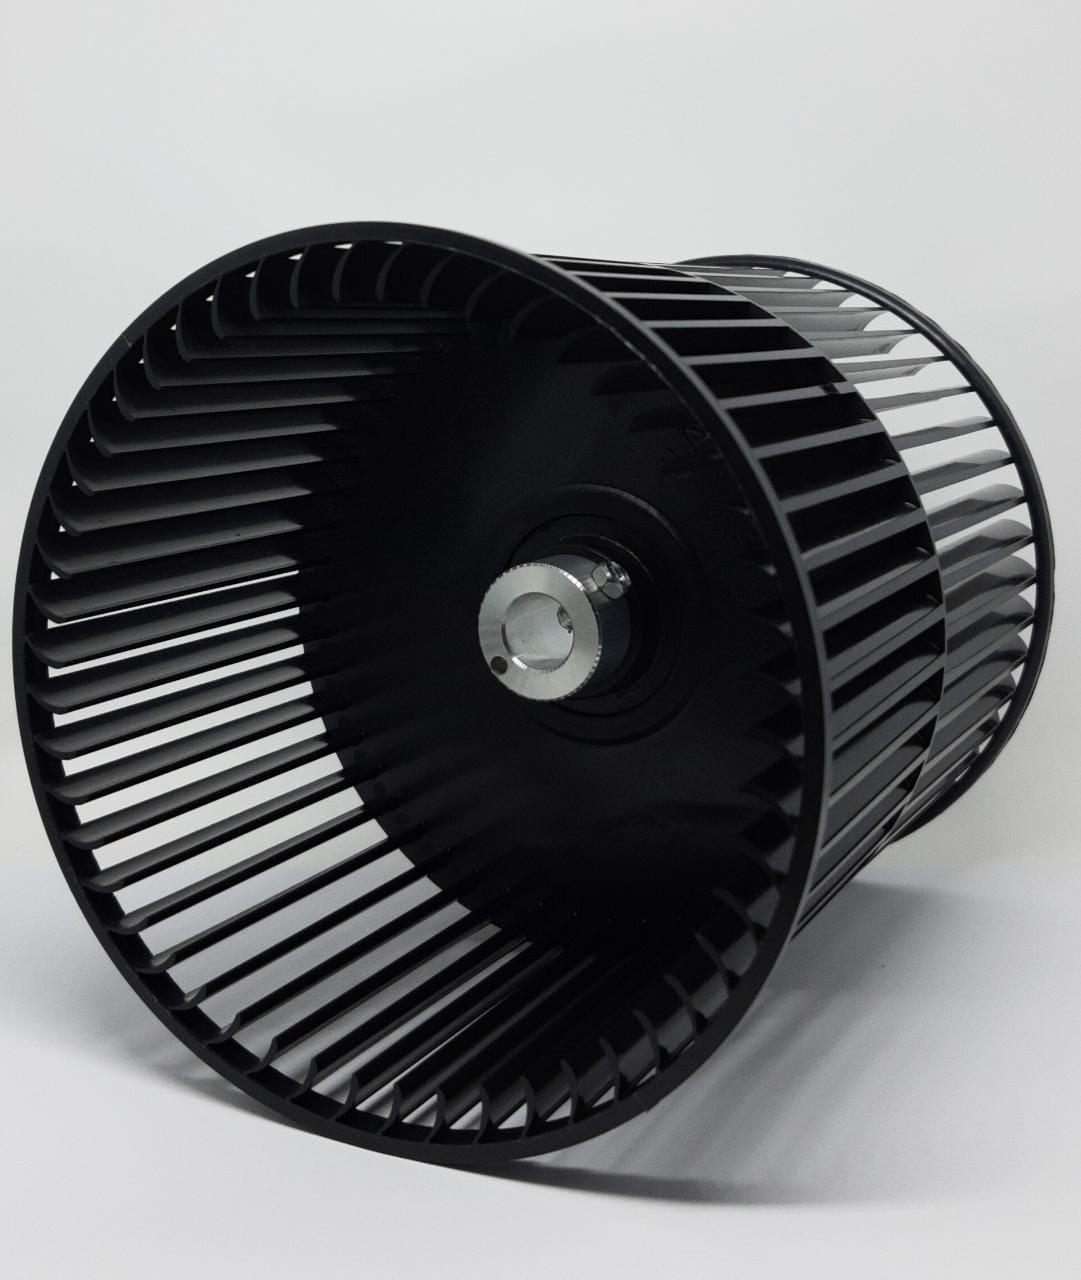 Turbina Evaporadora Piso Teto 18000 A 80000 Btus Elgin